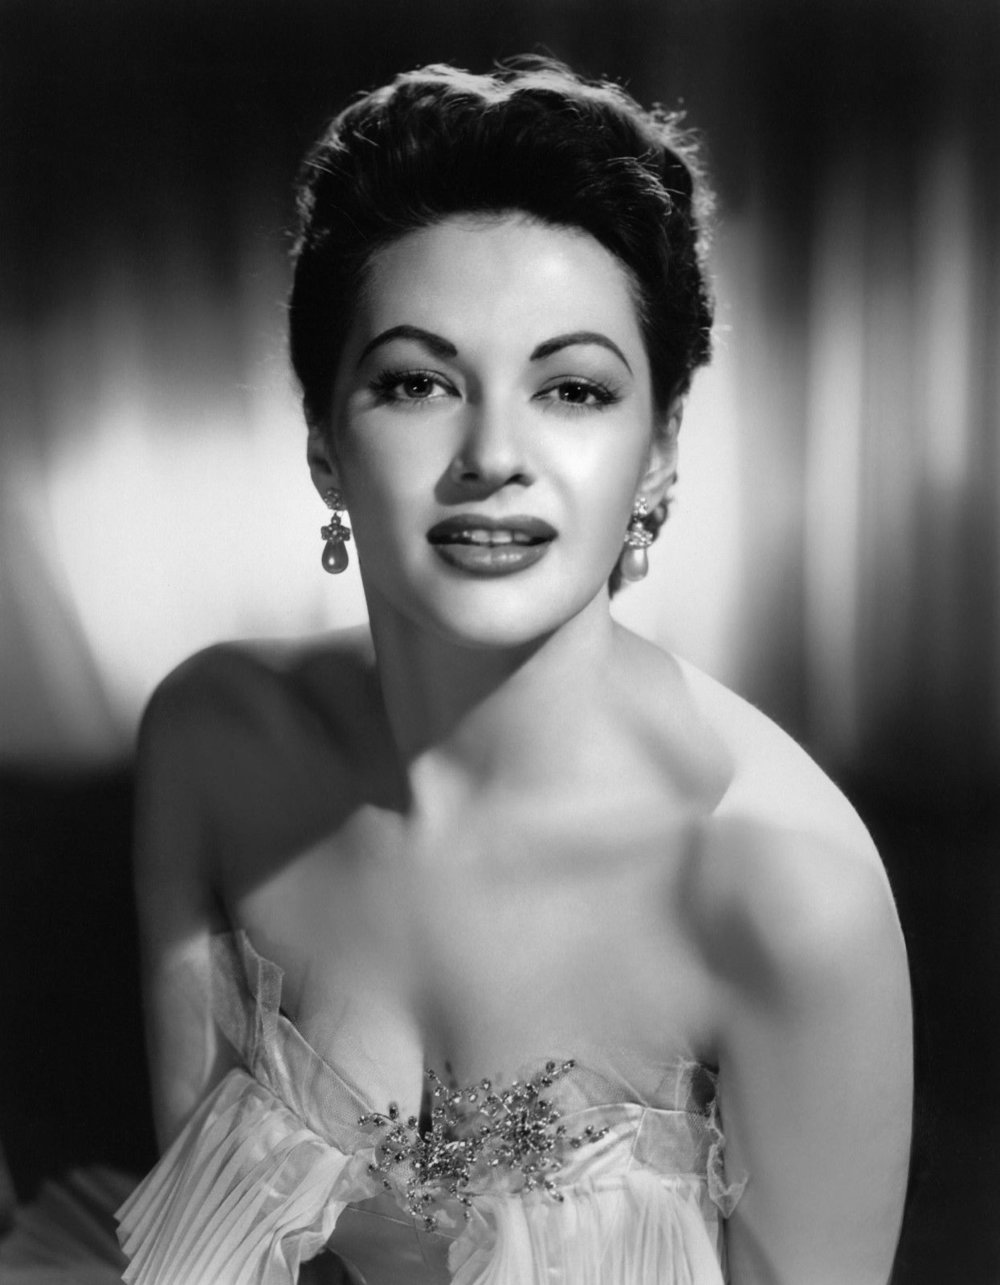 Yvonne_De_Carlo_publicity_photo c. 1955.jpg